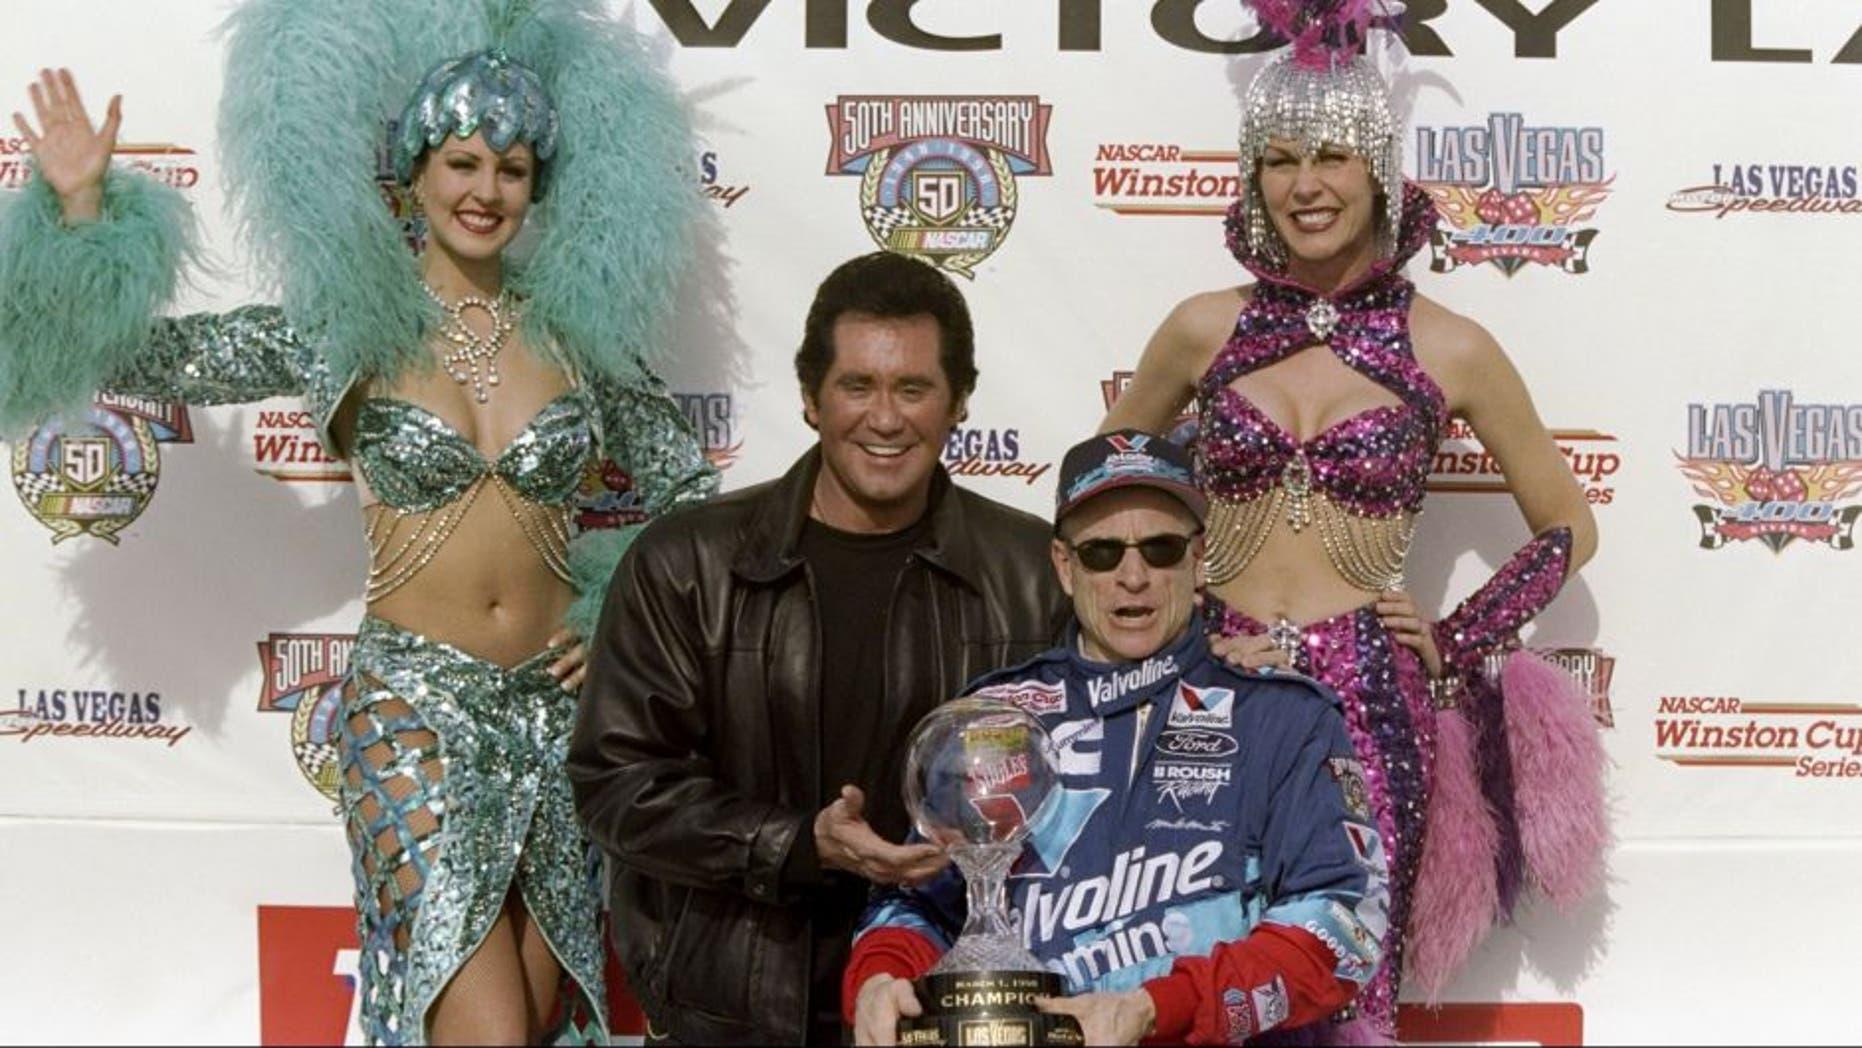 28 Feb 1998: Mark Martin celebrates after winning the Las Vegas 400 at the Las Vegas Motor Speedway in Las Vegas, Nevada. Mandatory Credit: David Taylor /Allsport